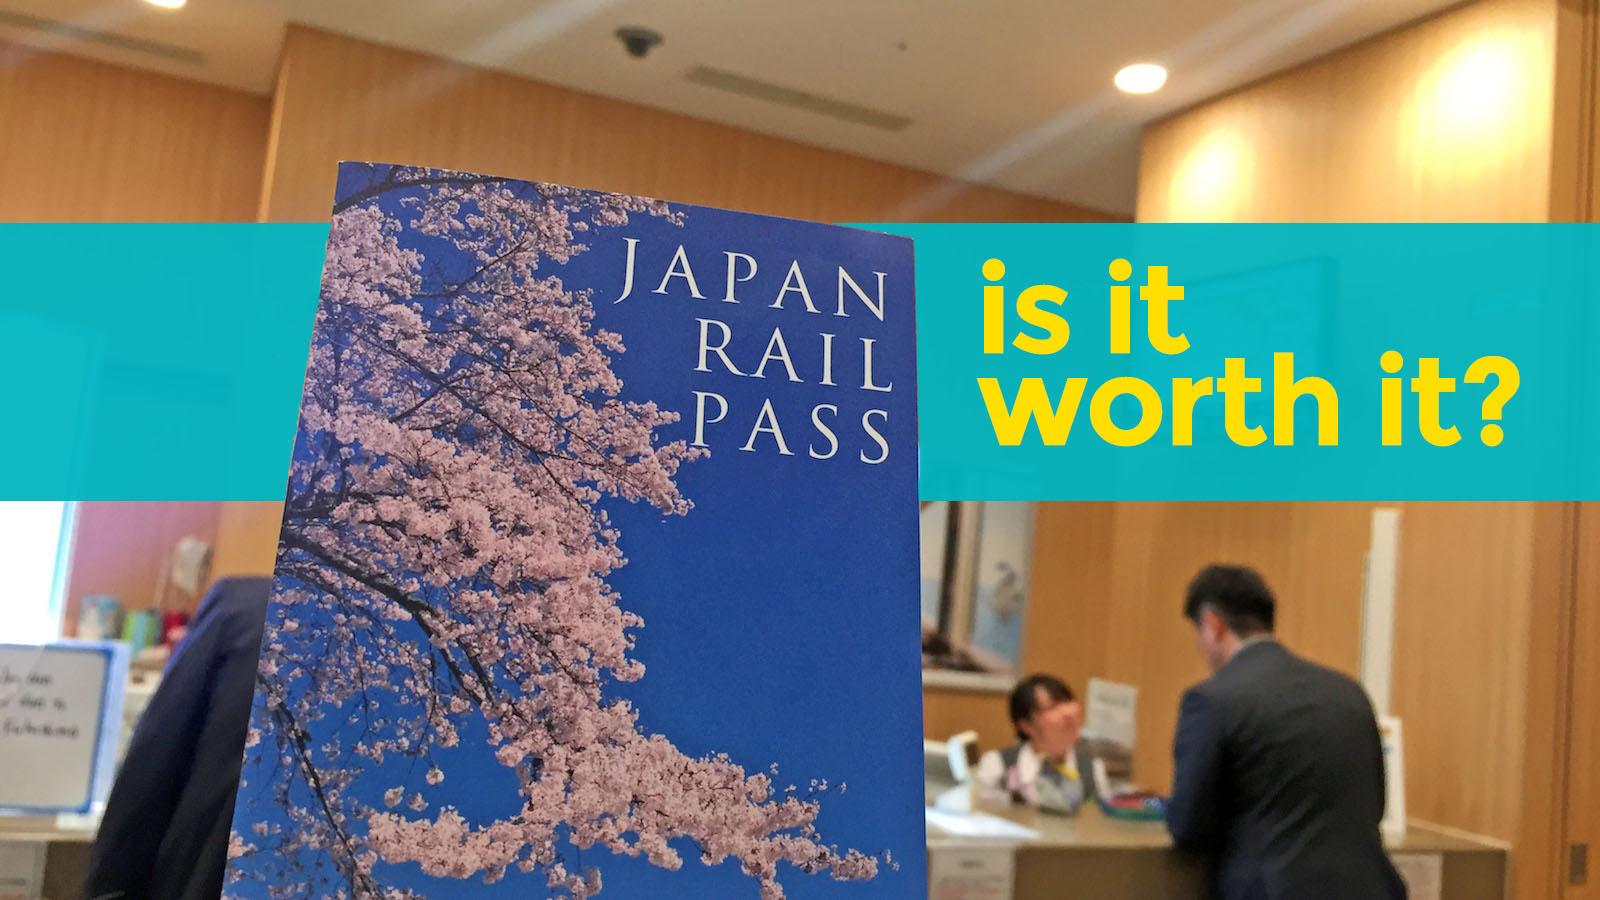 JR-Pass Image by: jr pass shinkansen blog.